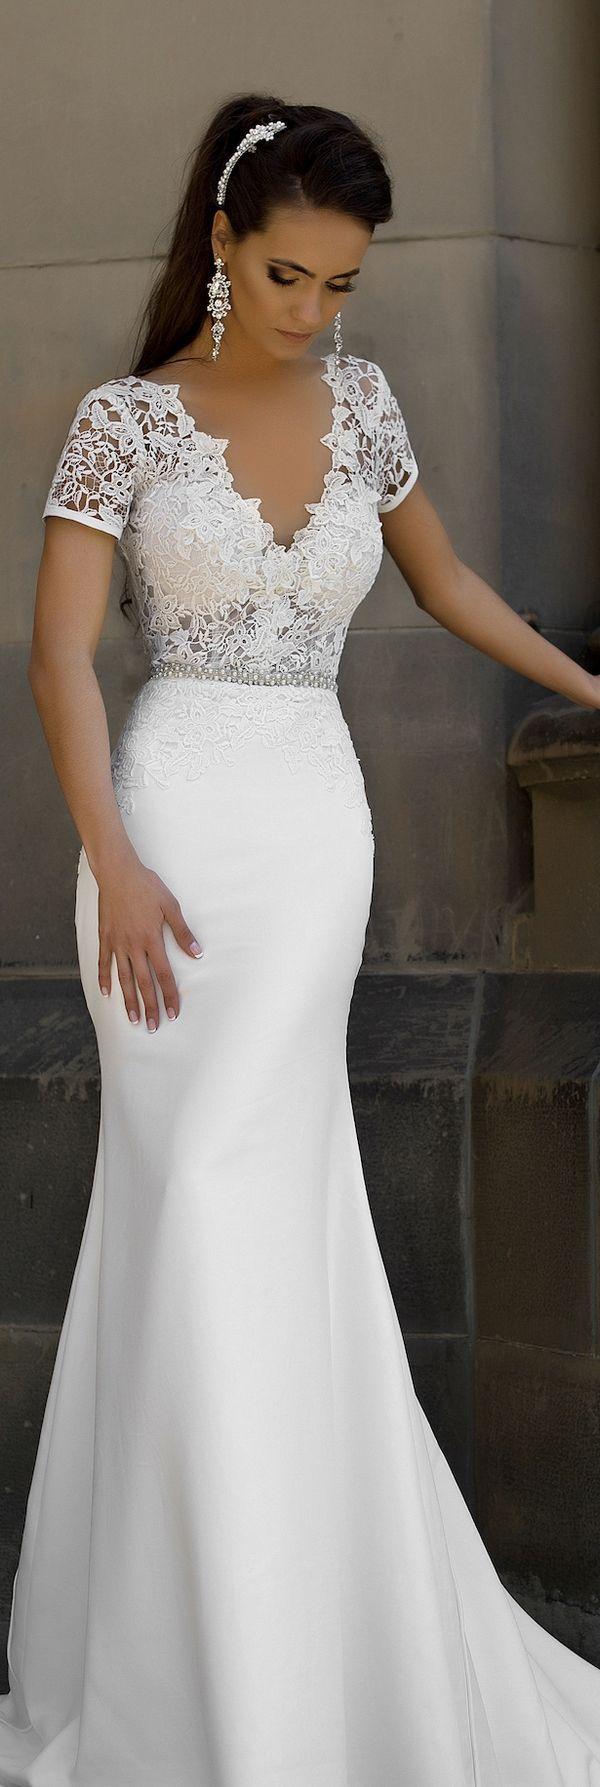 Mature bride wedding dresses  The Most Hottest Milla Nova  Wedding Dresses  Wedding dress